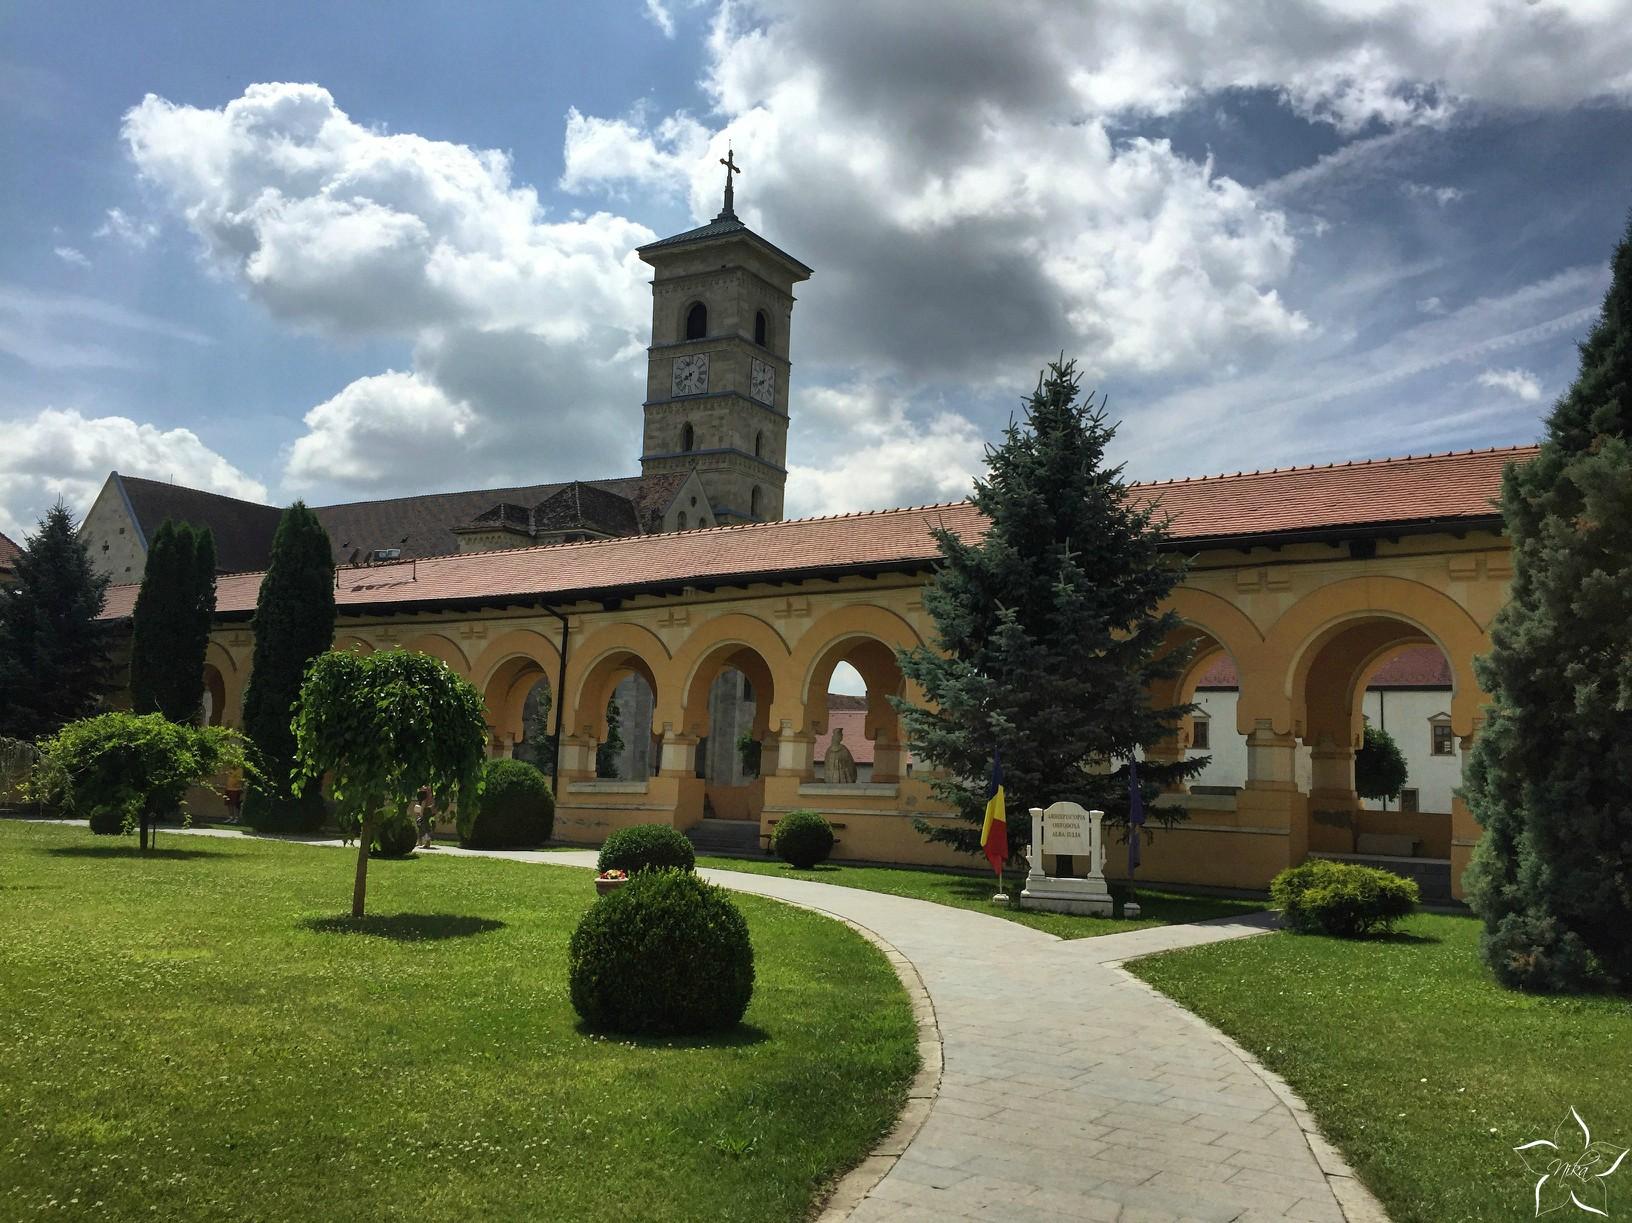 alba iulia church romania